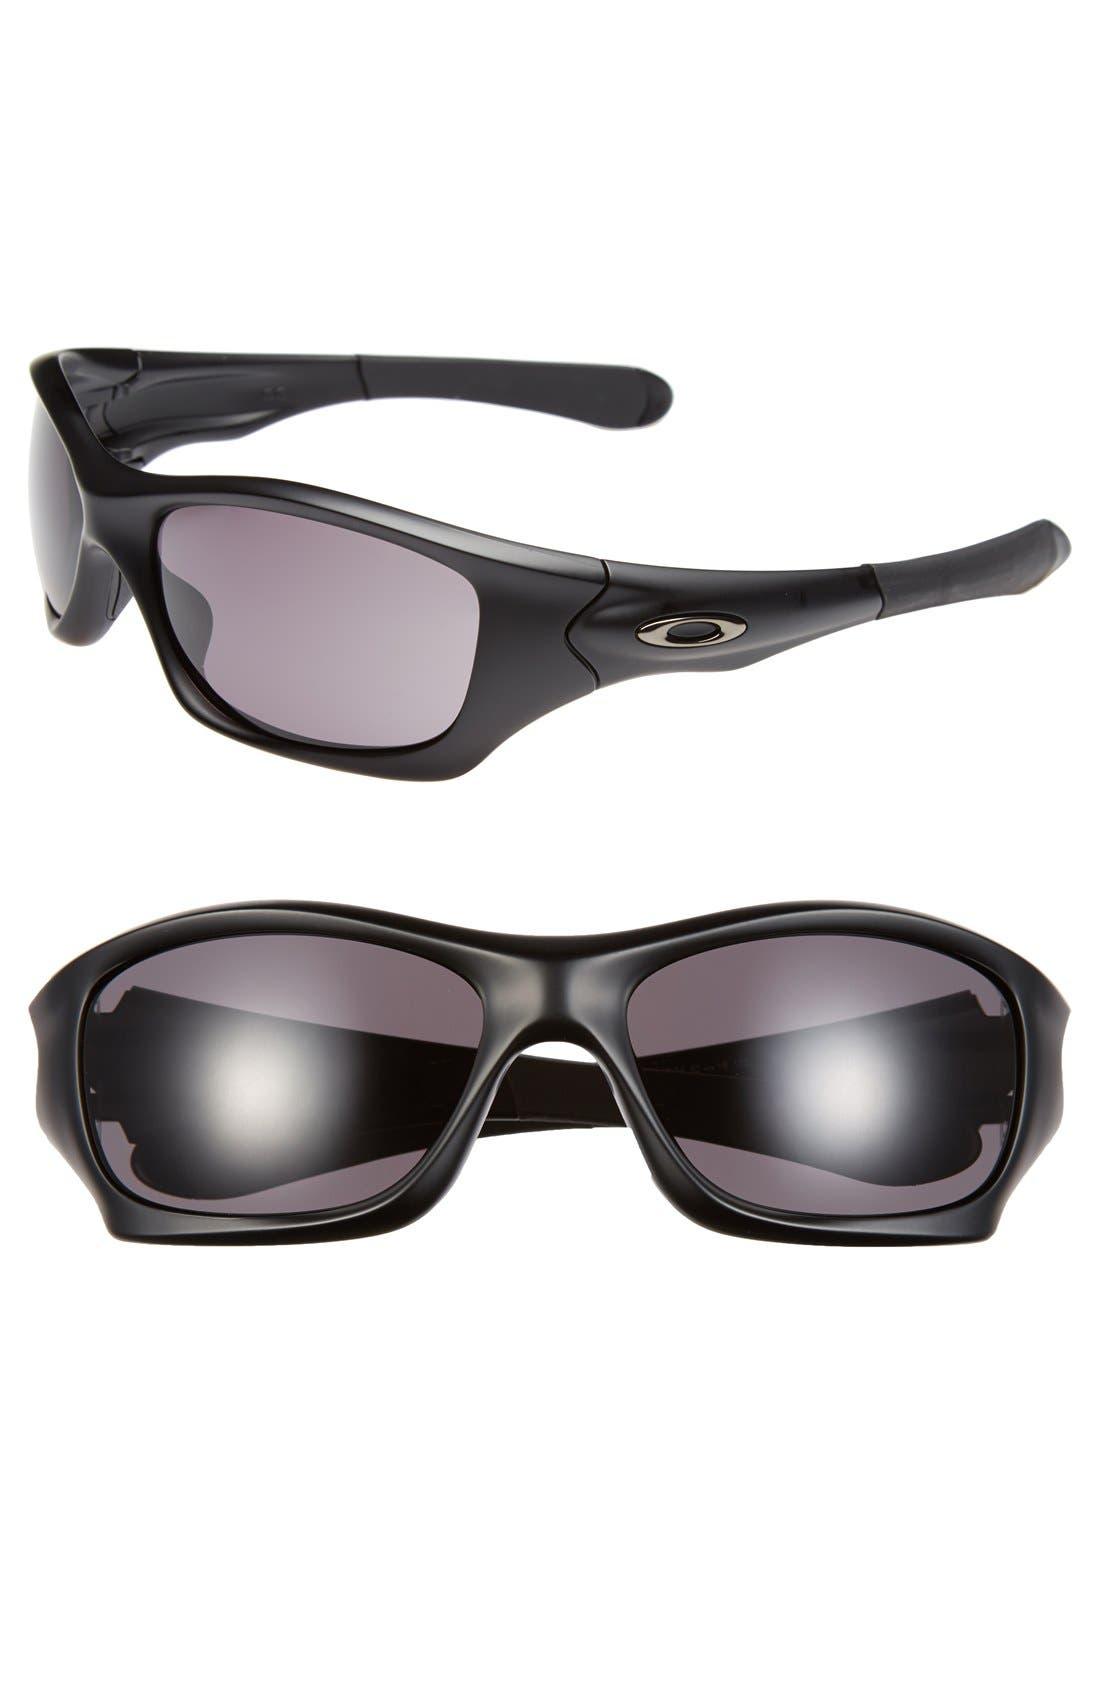 Alternate Image 1 Selected - Oakley 'Pit Bull' 62mm Sunglasses